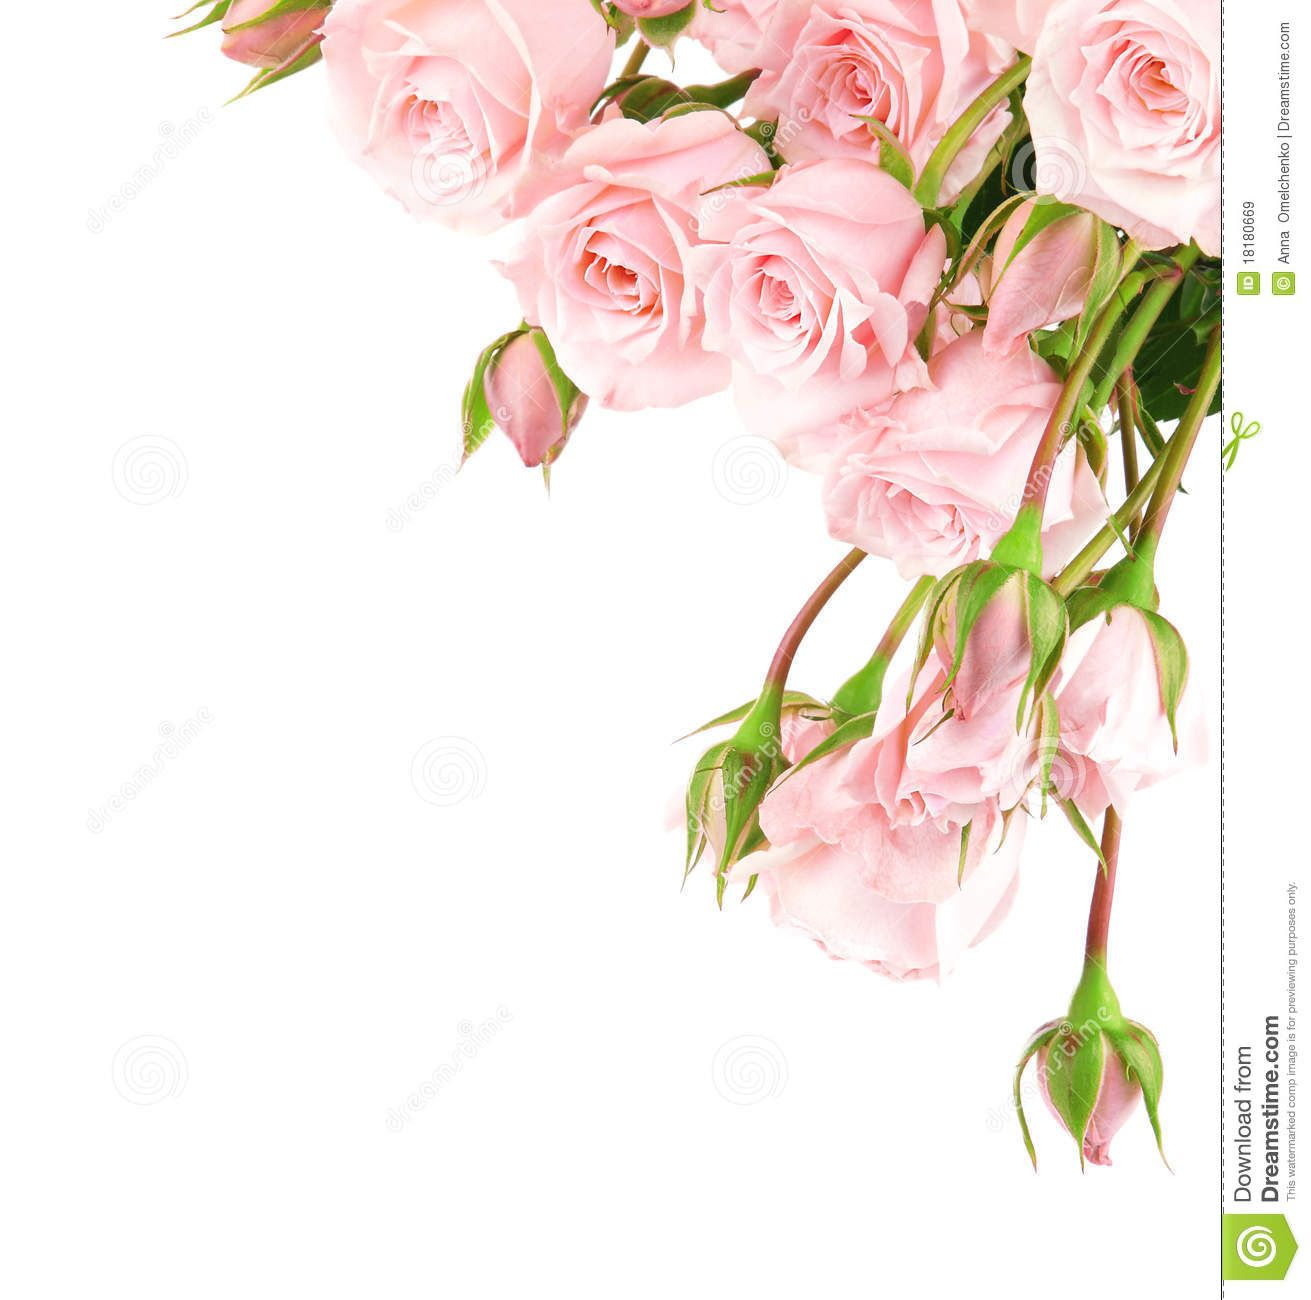 Pink rose border clipart clip art freeuse download Pink Roses Border Clipart Fresh Pink Roses Border | PINK ... clip art freeuse download